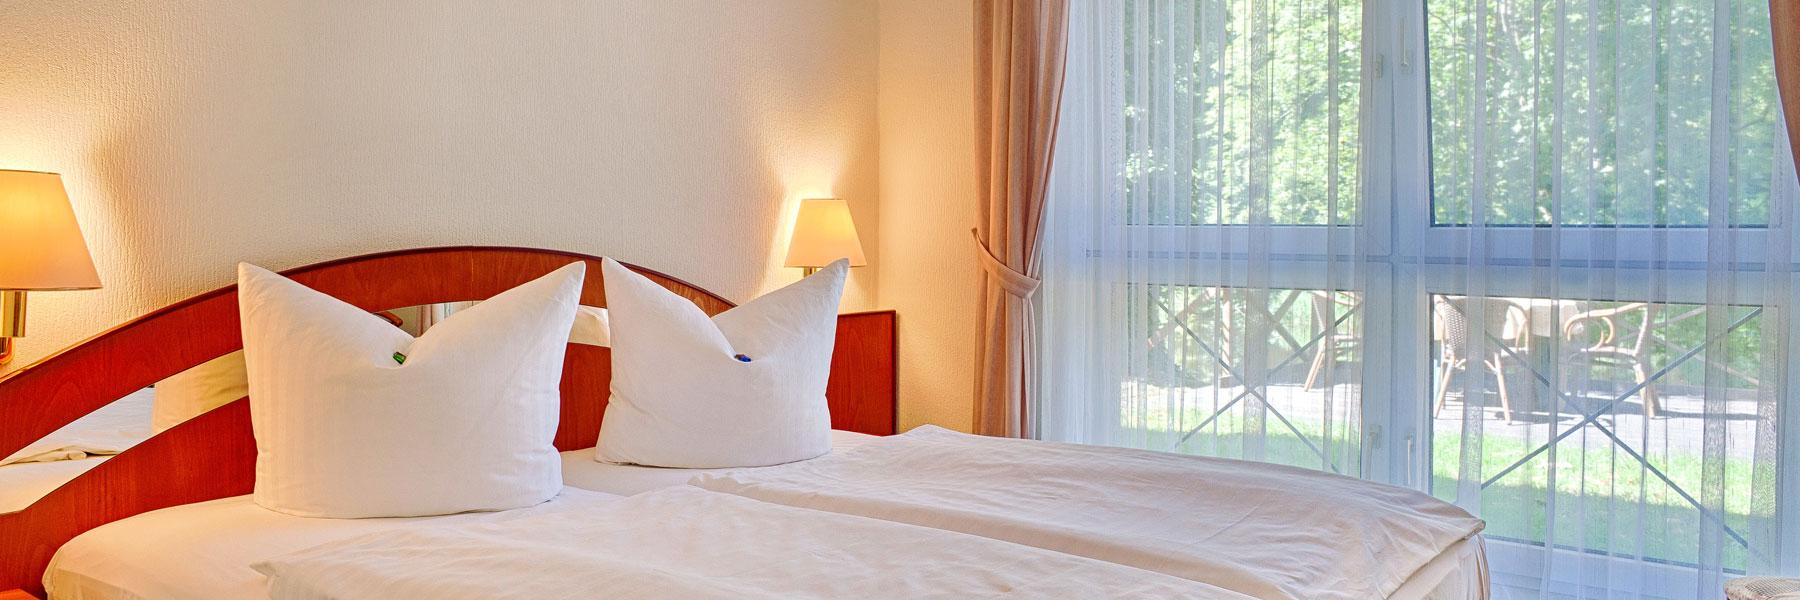 Doppelzimmer - Hotel Carmina am See